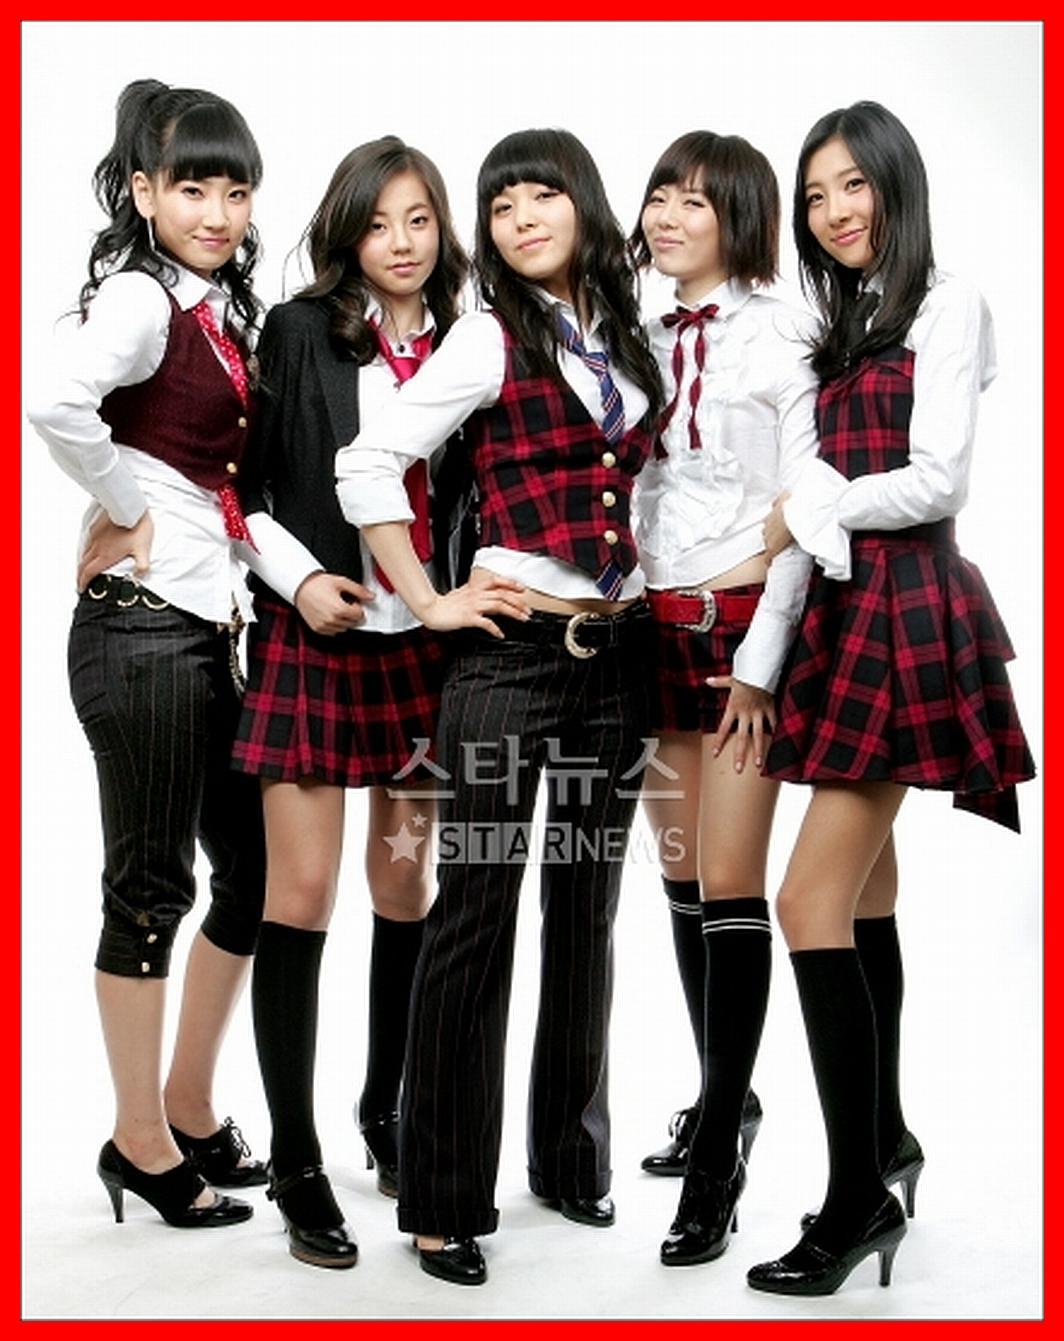 click for imagesize wallpaper Wonder Girls school uniform